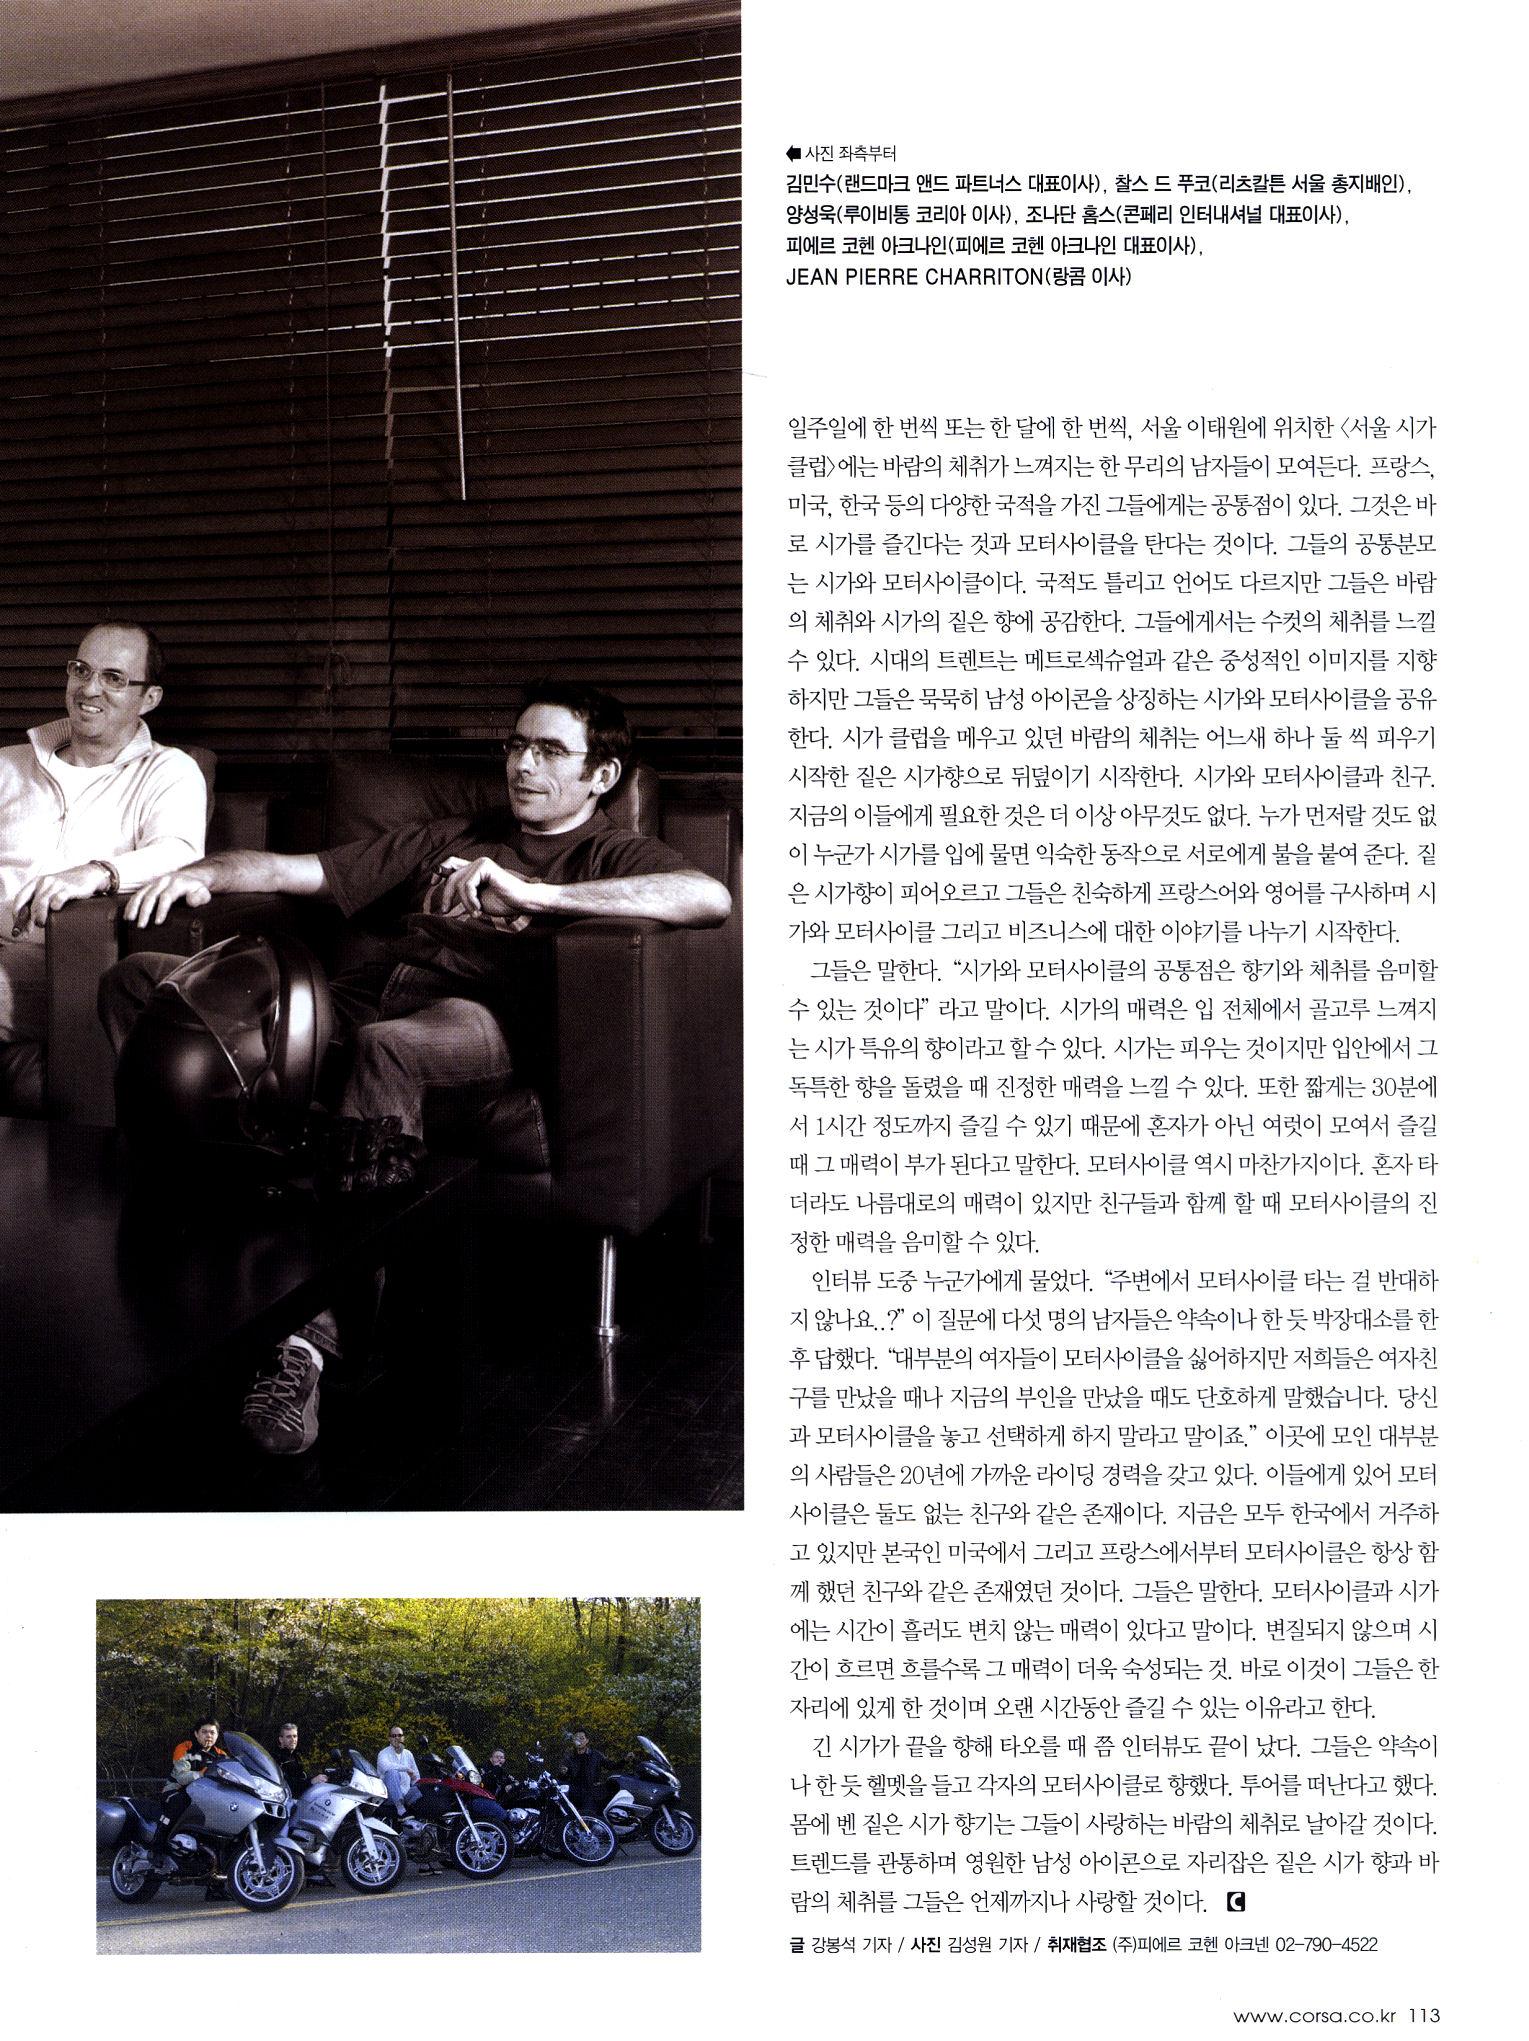 2005-5 Corsa article 2.jpg